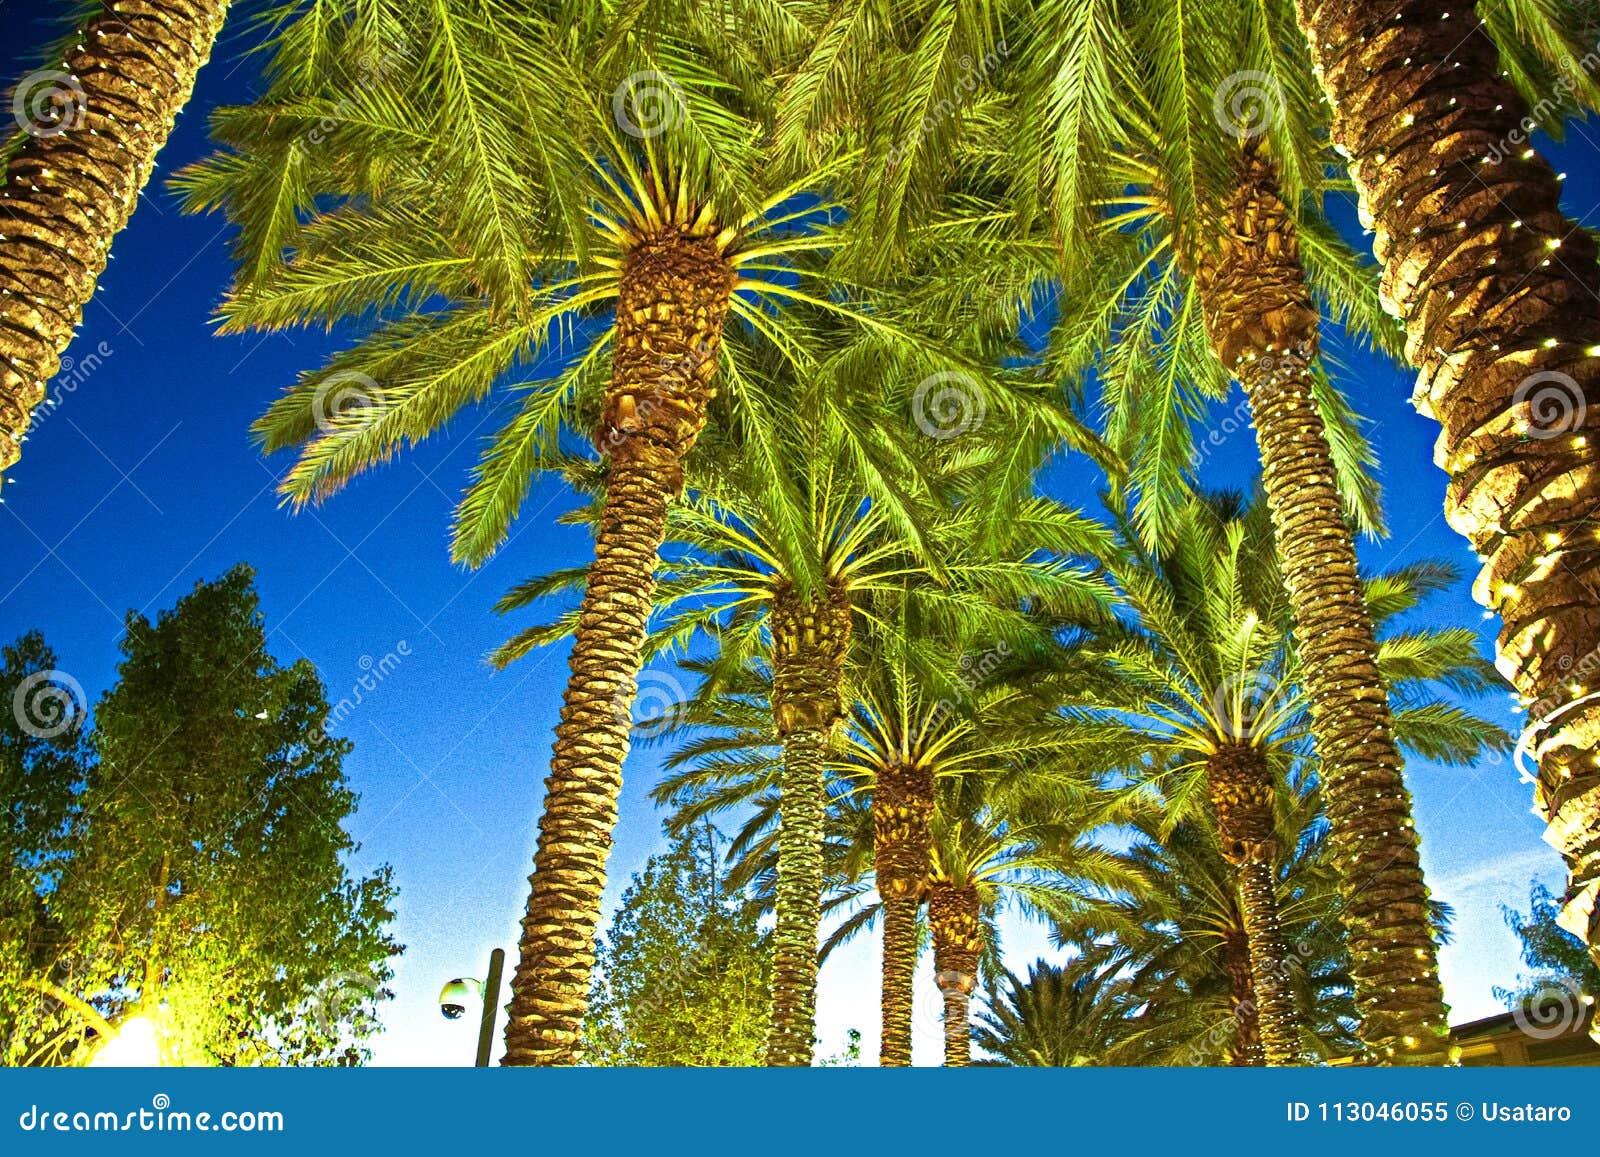 illuminated palm trees at a street stock image image of lighting